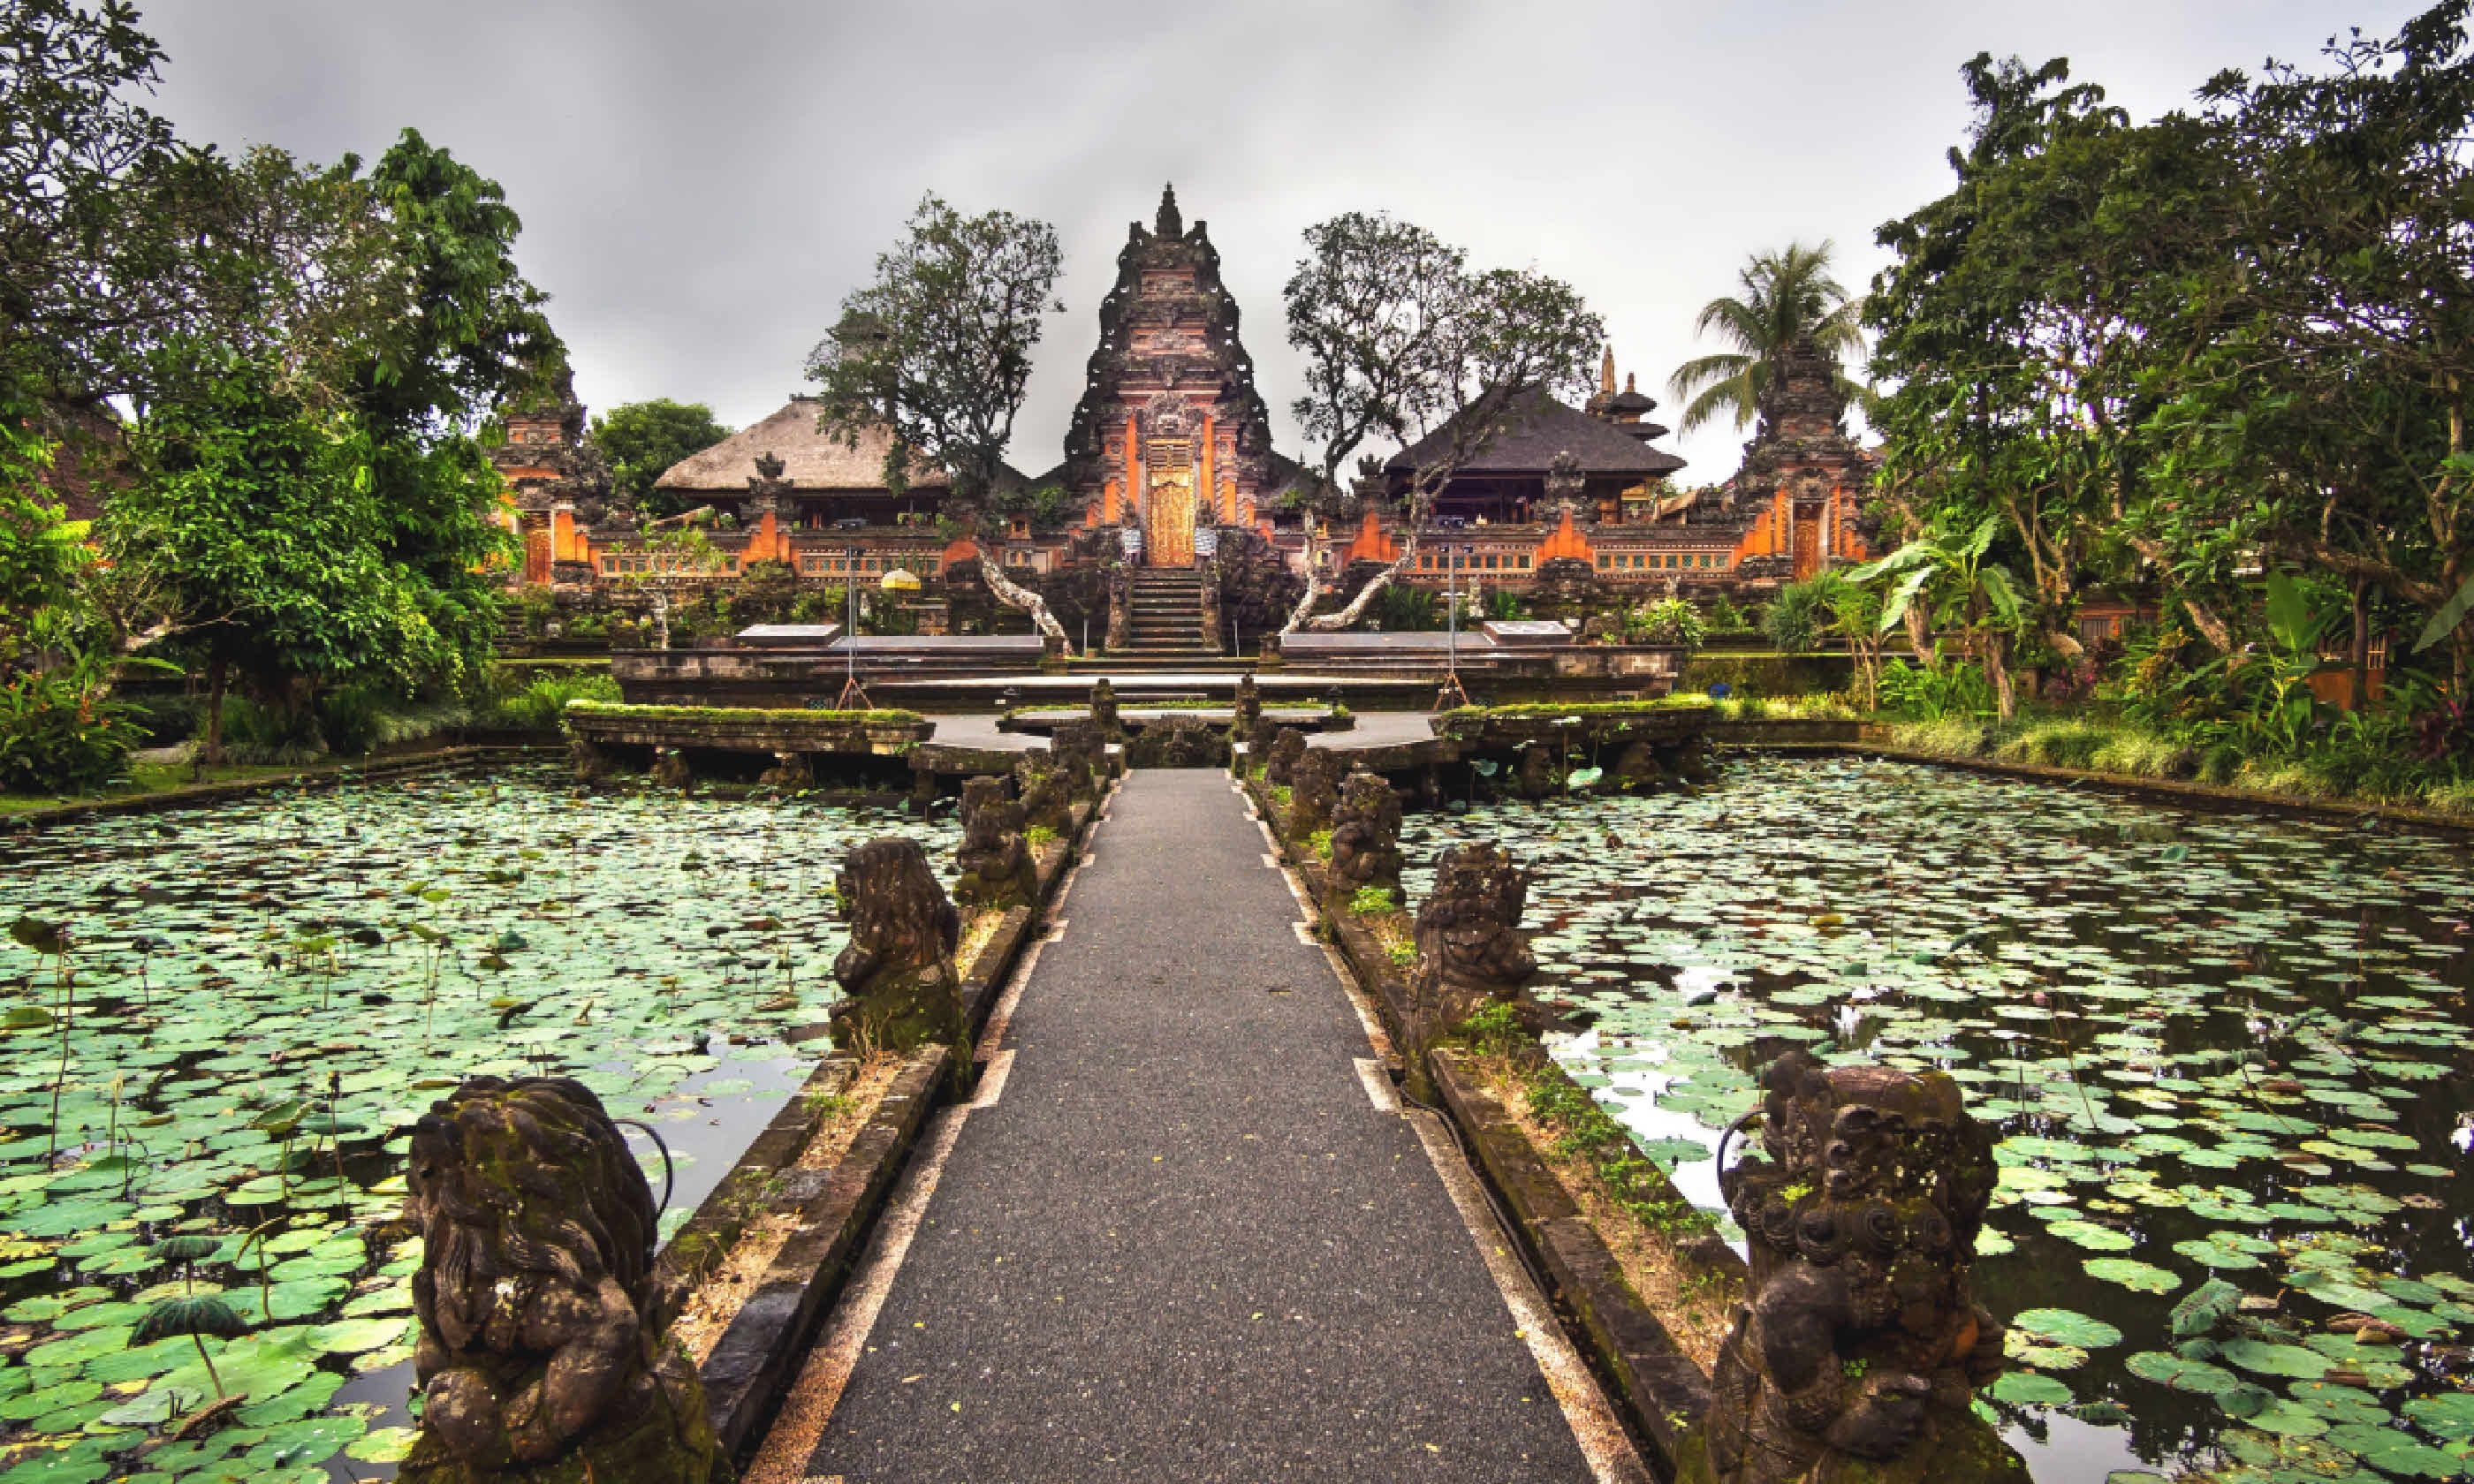 Pura Saraswati temple in Ubud, Bali (Shutterstock)